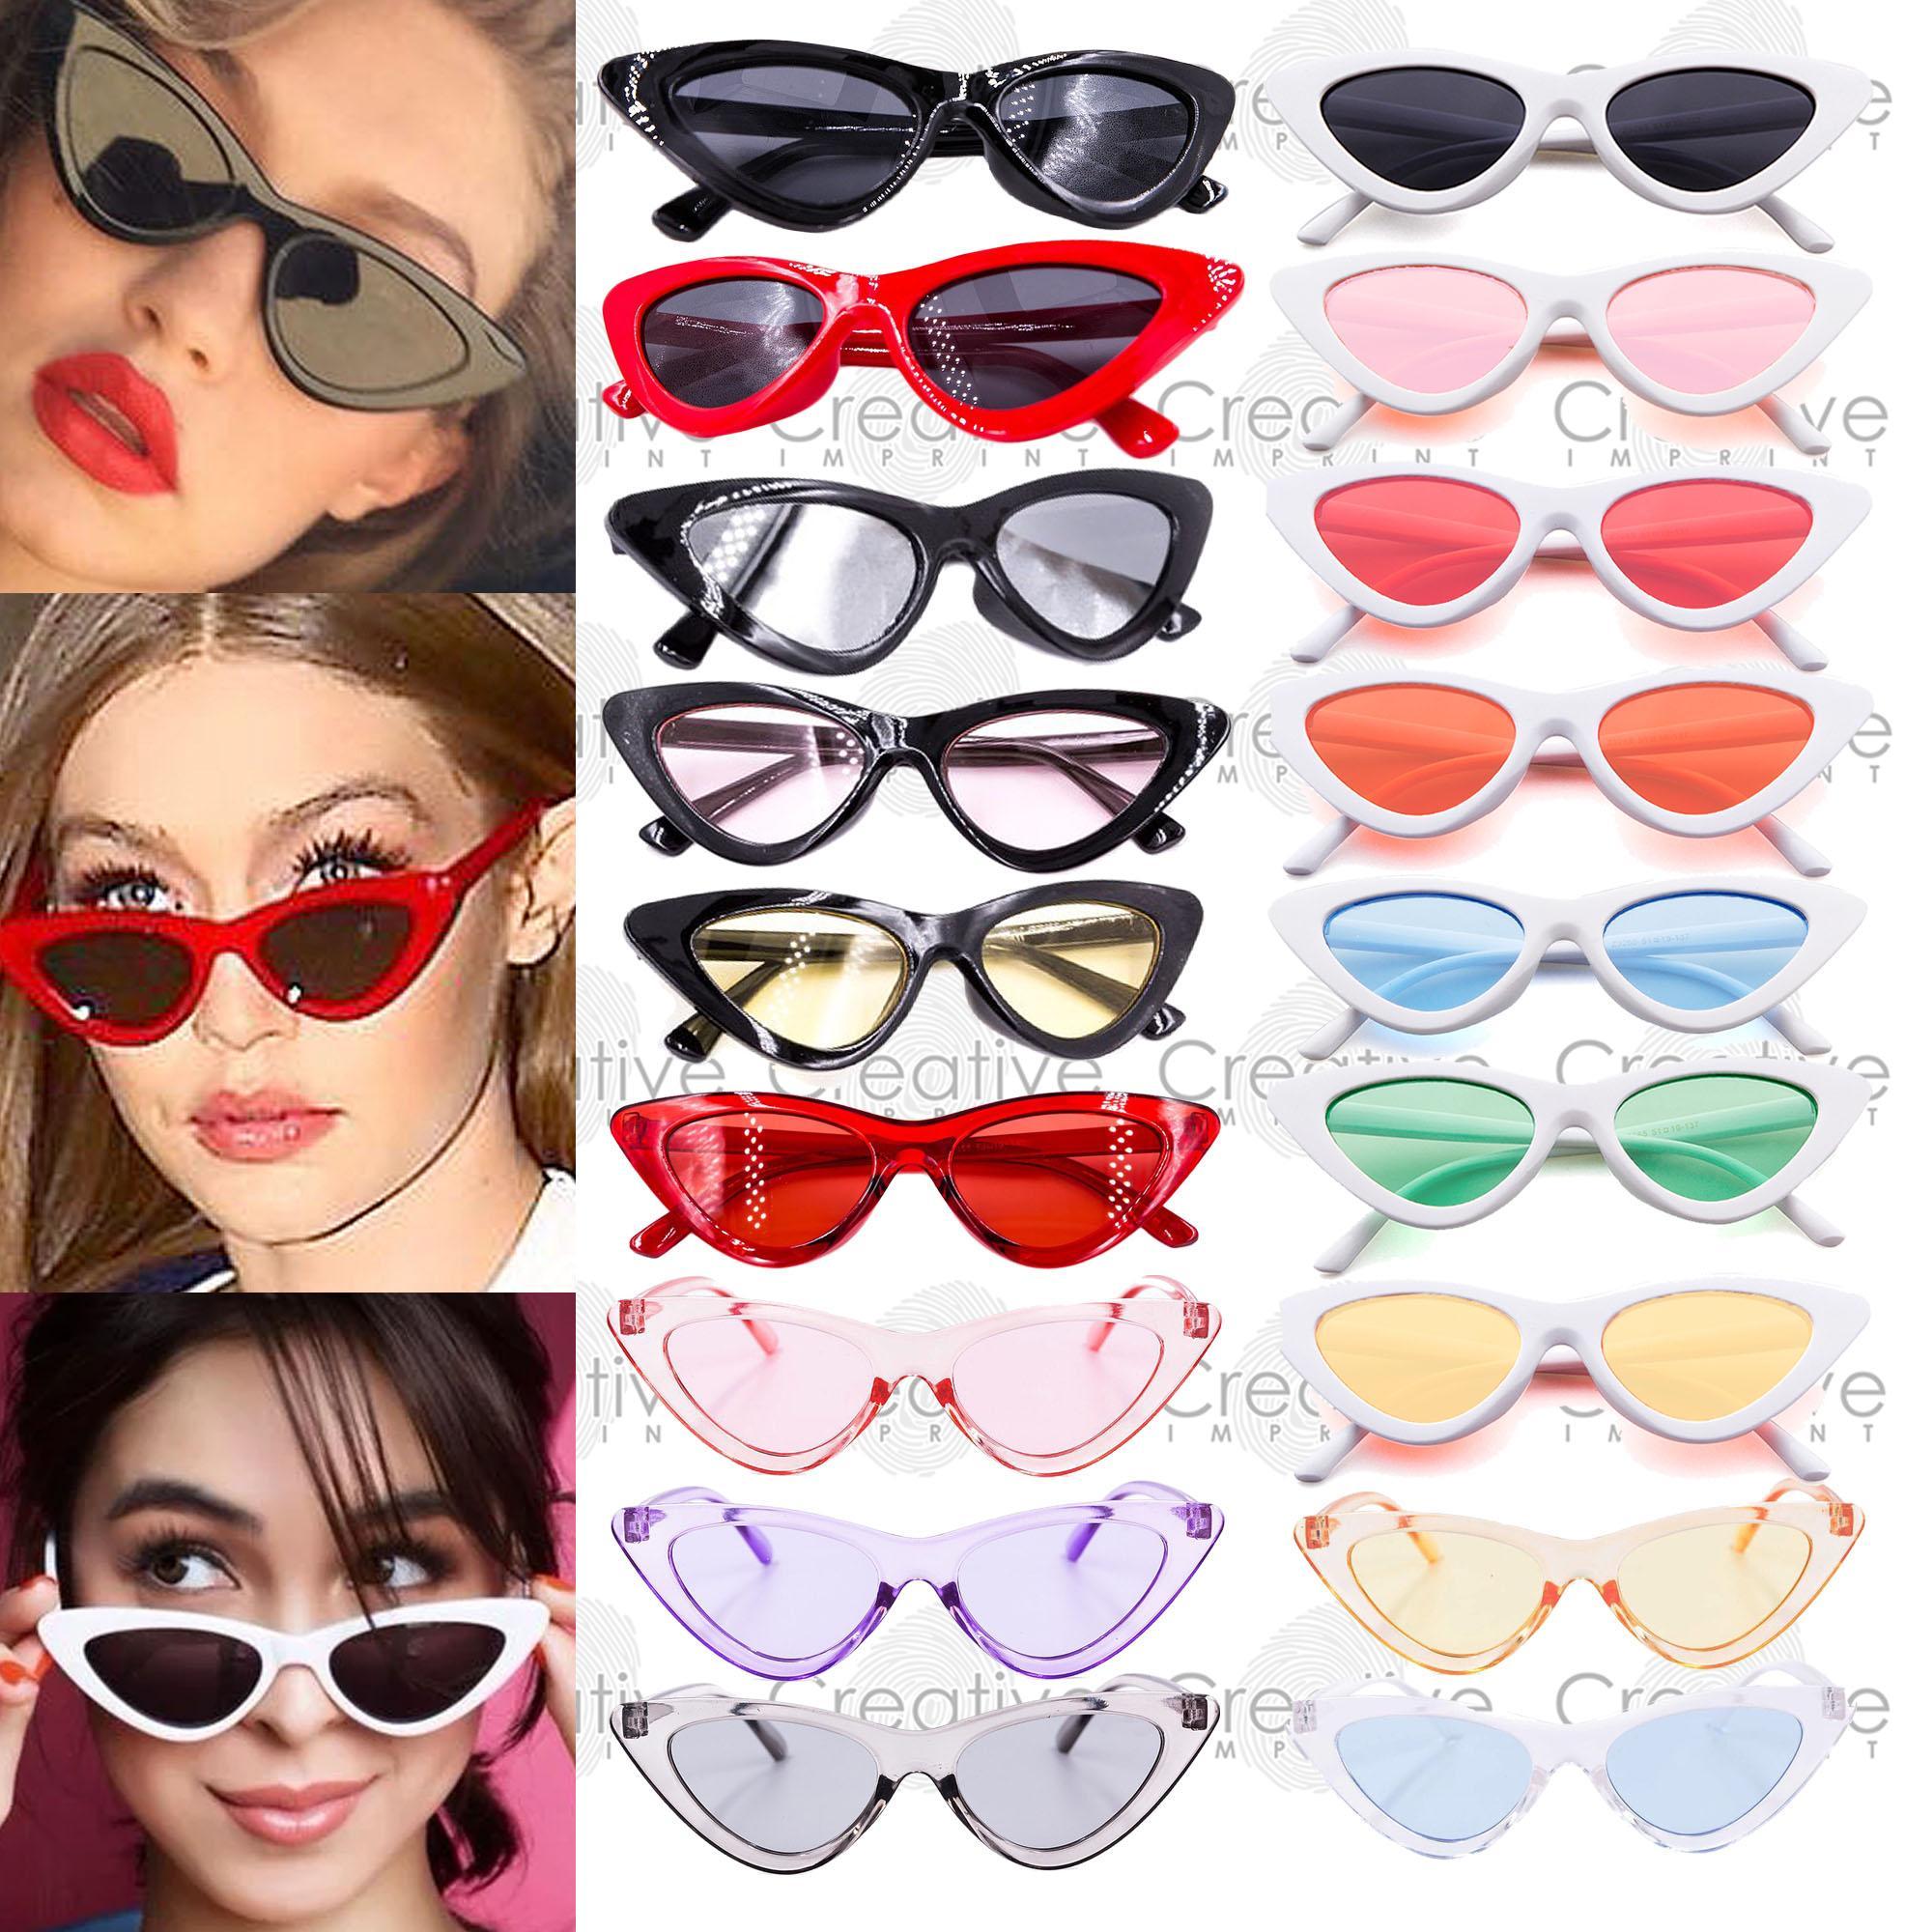 7d22acb3d7e Creative Imprint Lolita Cat Eye Sunnies (FREE CASE   WIPER) Retro Sunglasses  Summer High